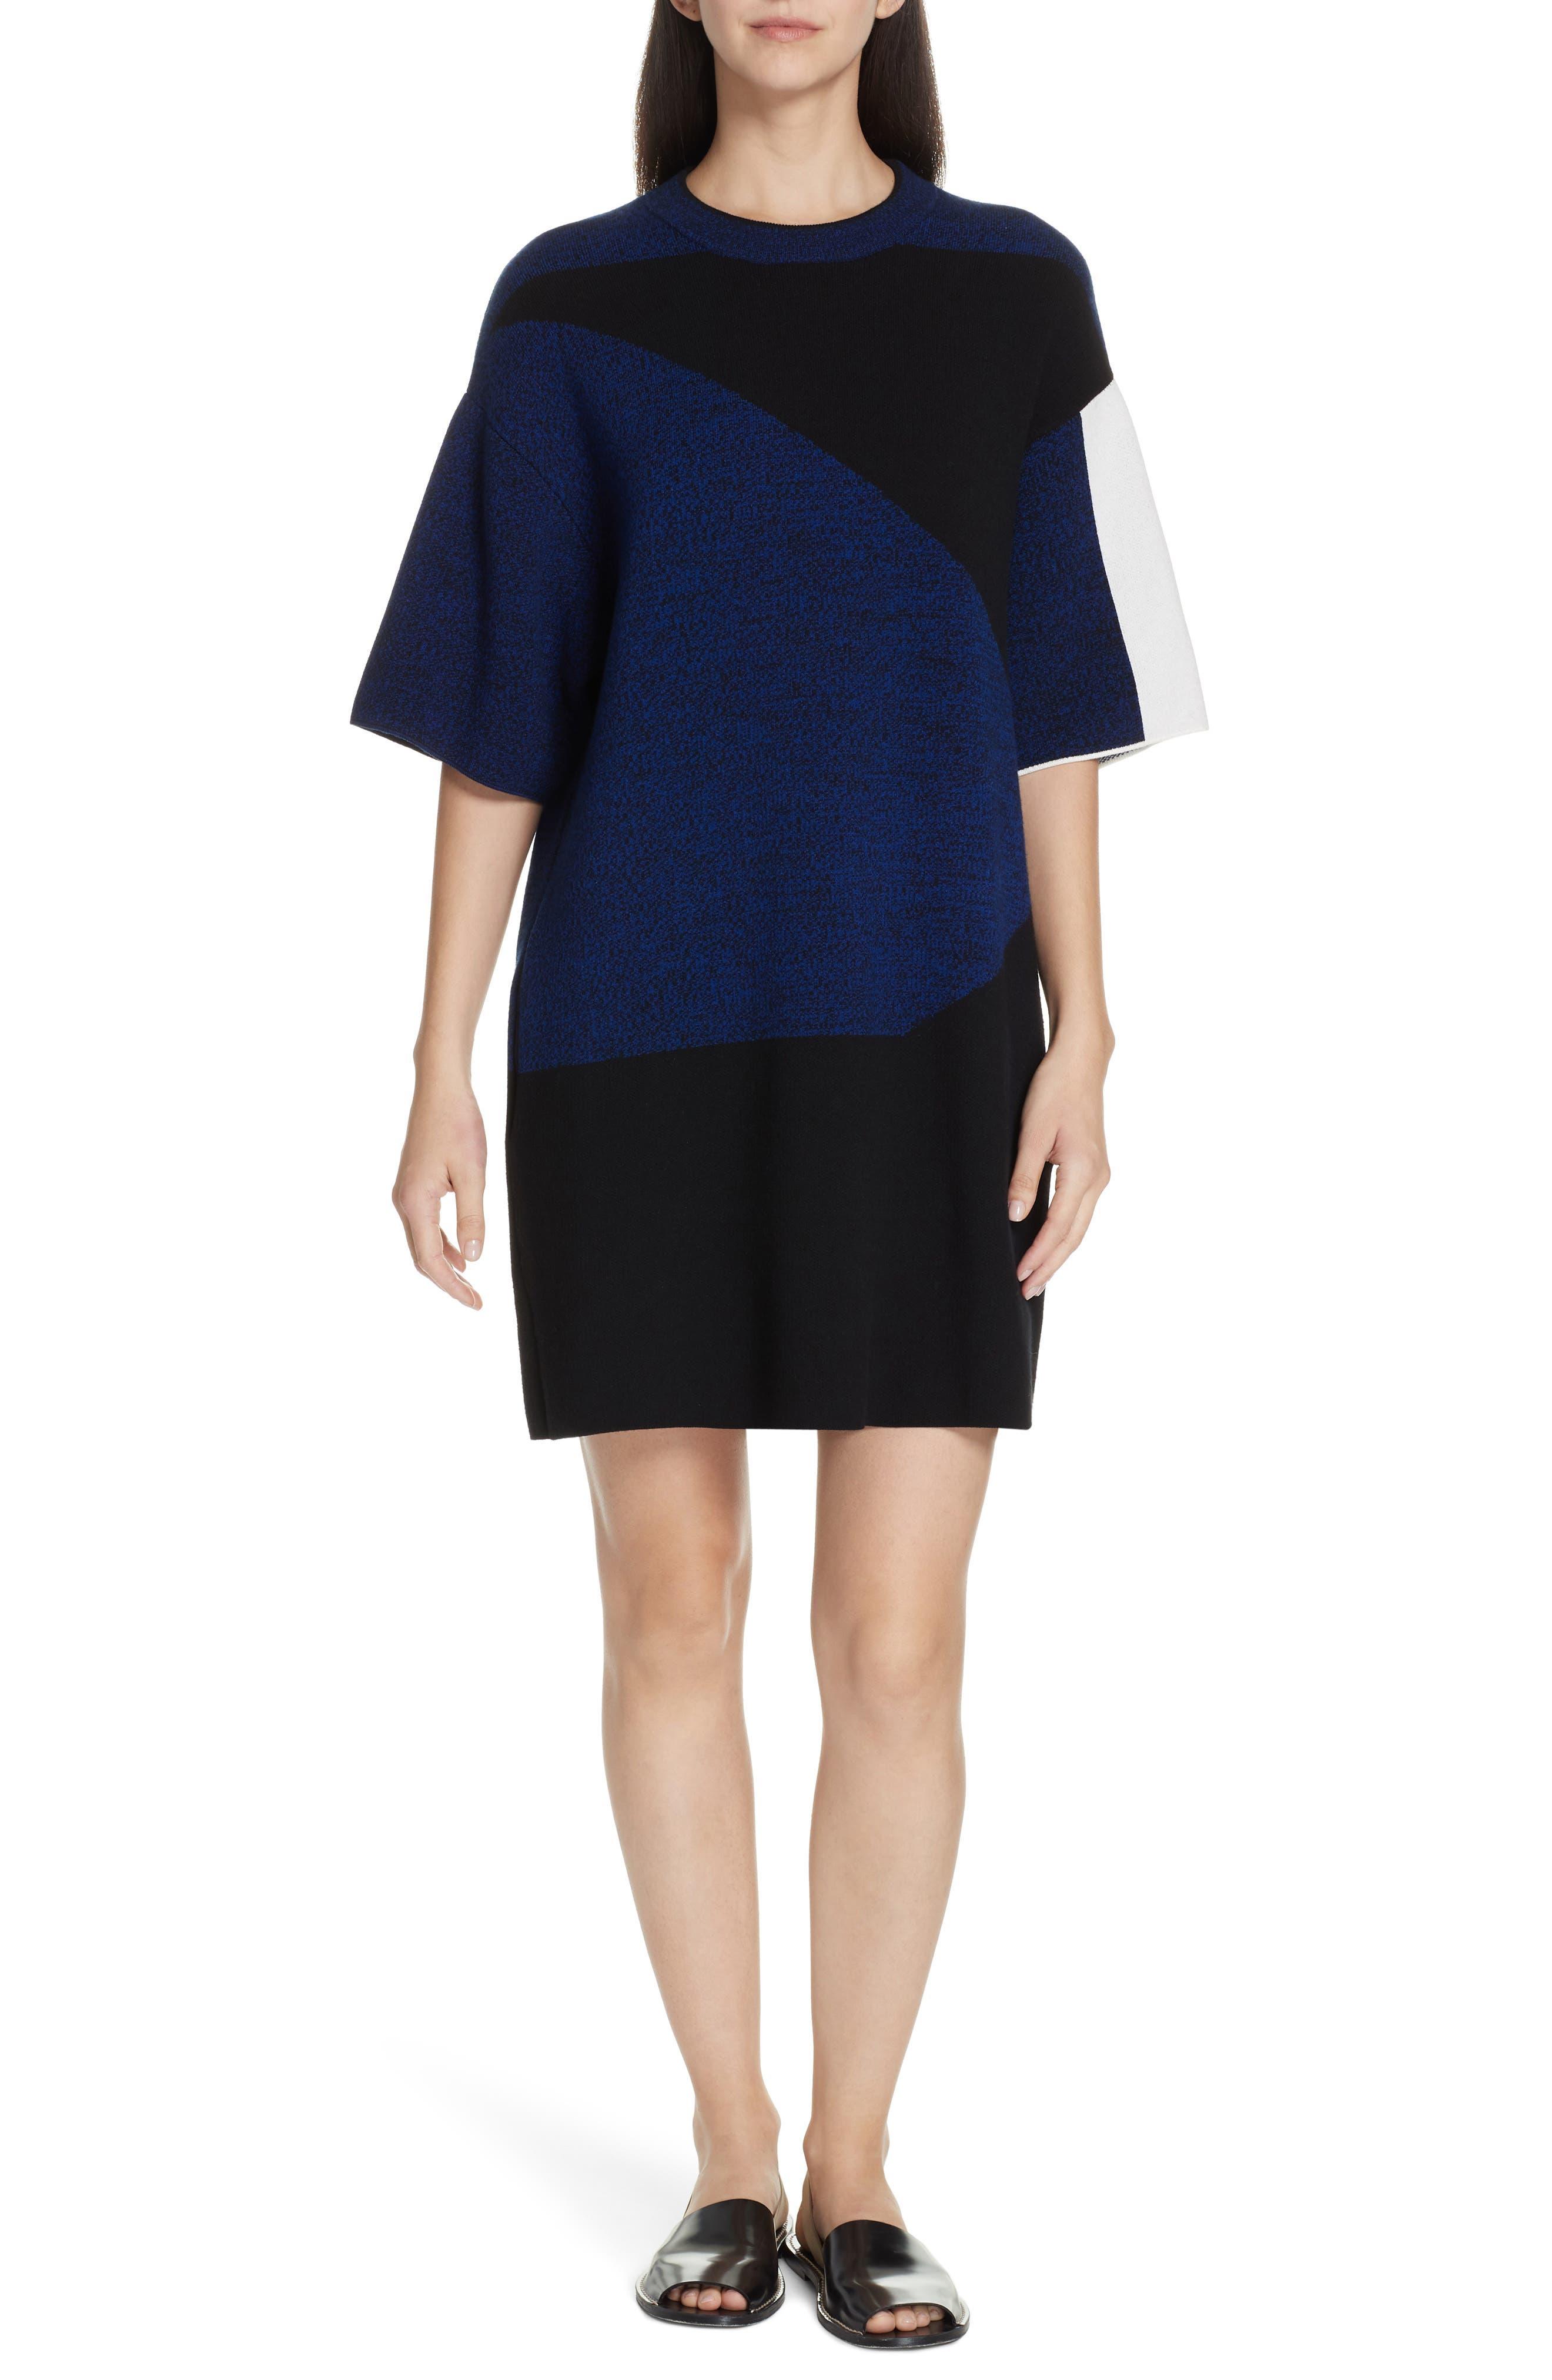 Proenza Schouler Pswl Colorblock Jacquard Shift Dress, Blue